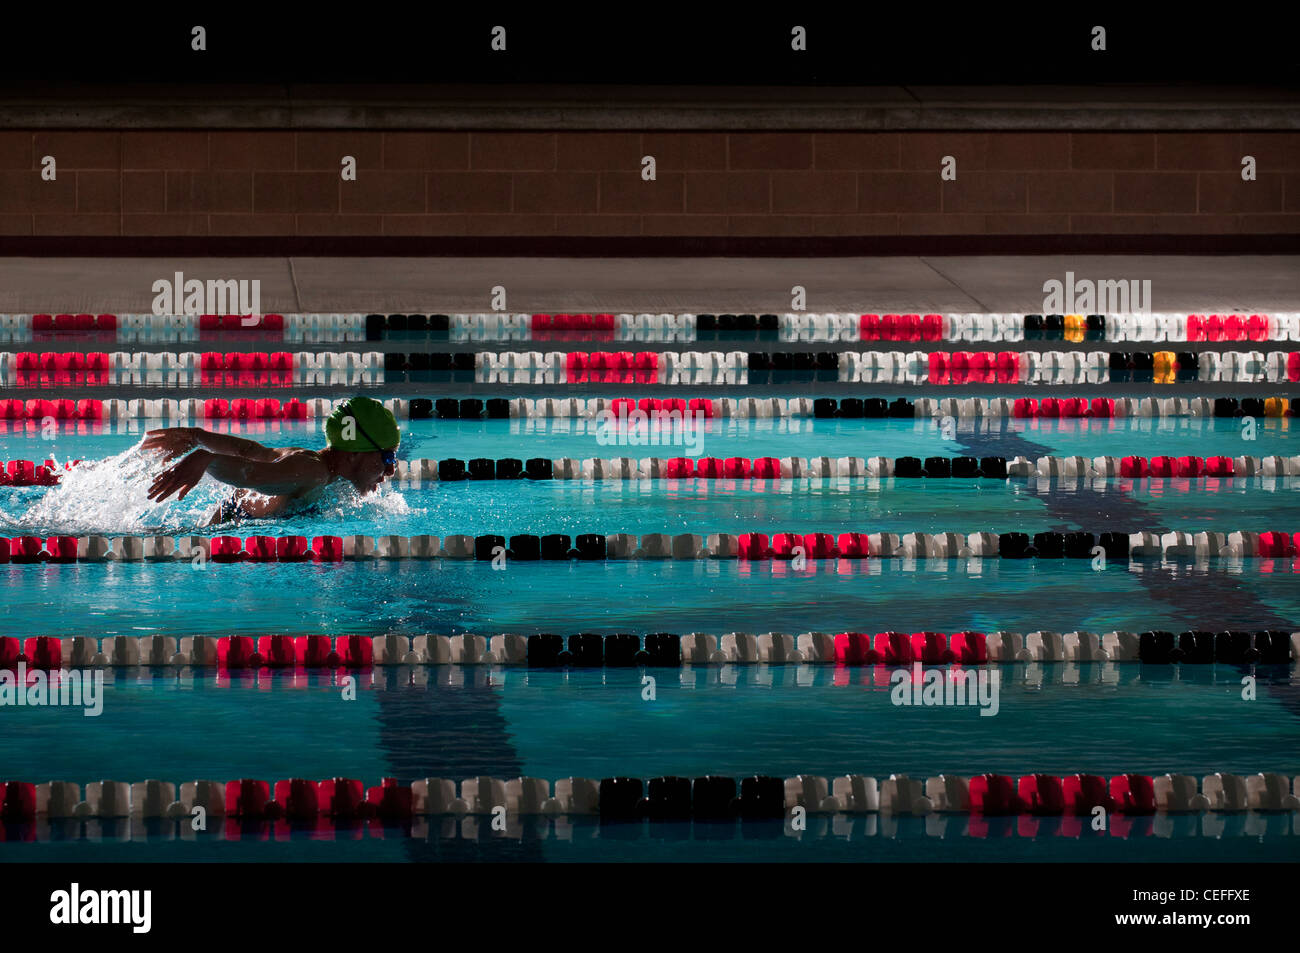 Woman swimming laps in pool - Stock Image